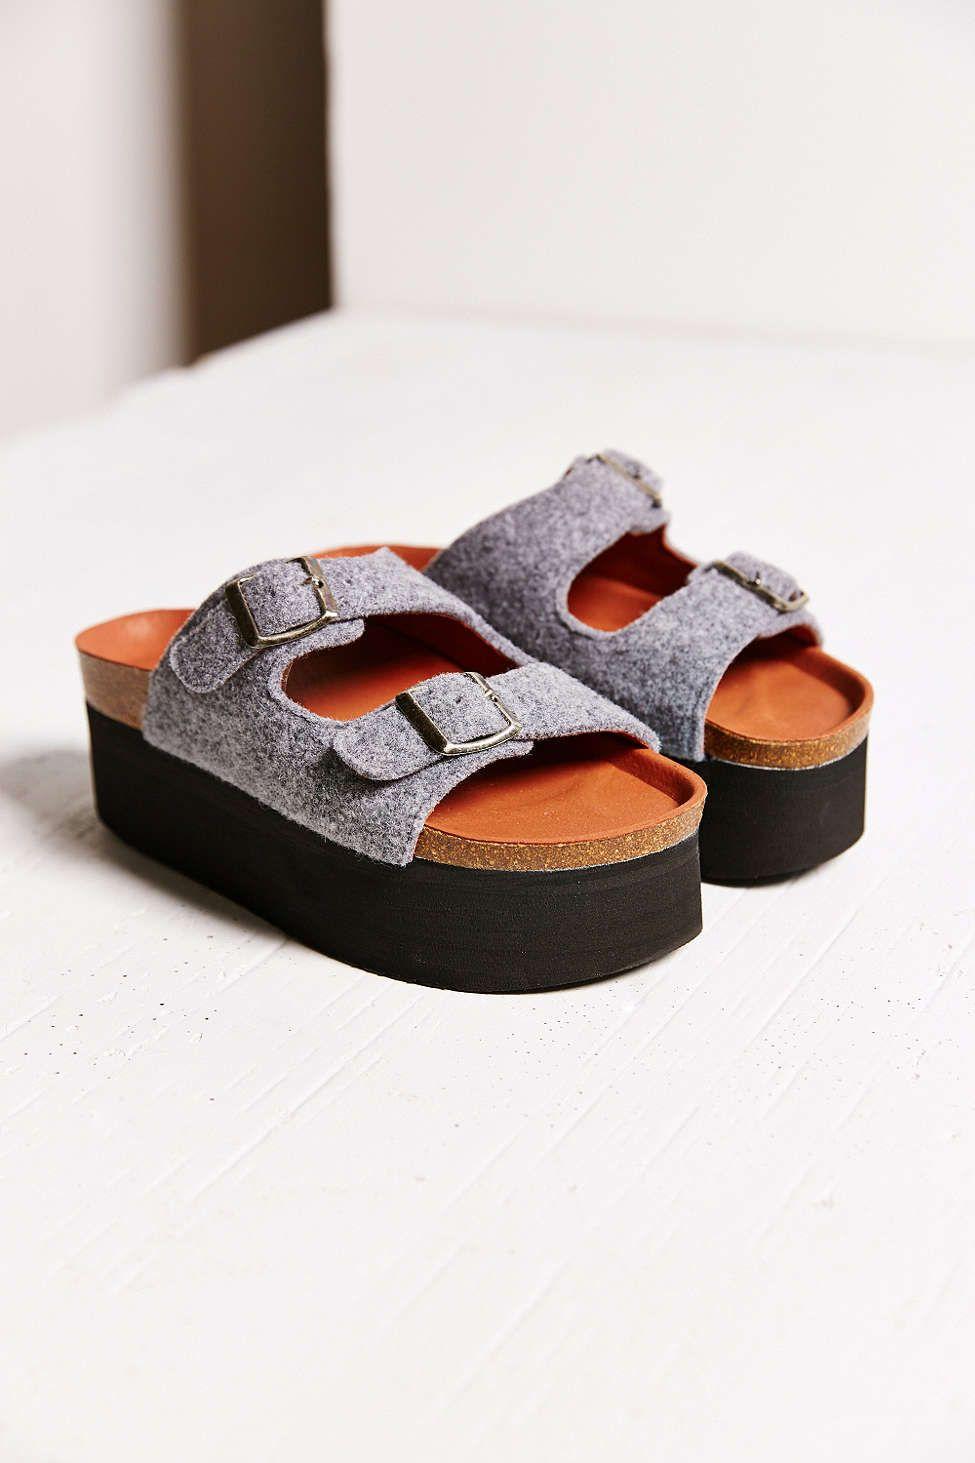 deeaf0b8d84 Sixtyseven Felt Indigo Platform Sandal - Urban Outfitters